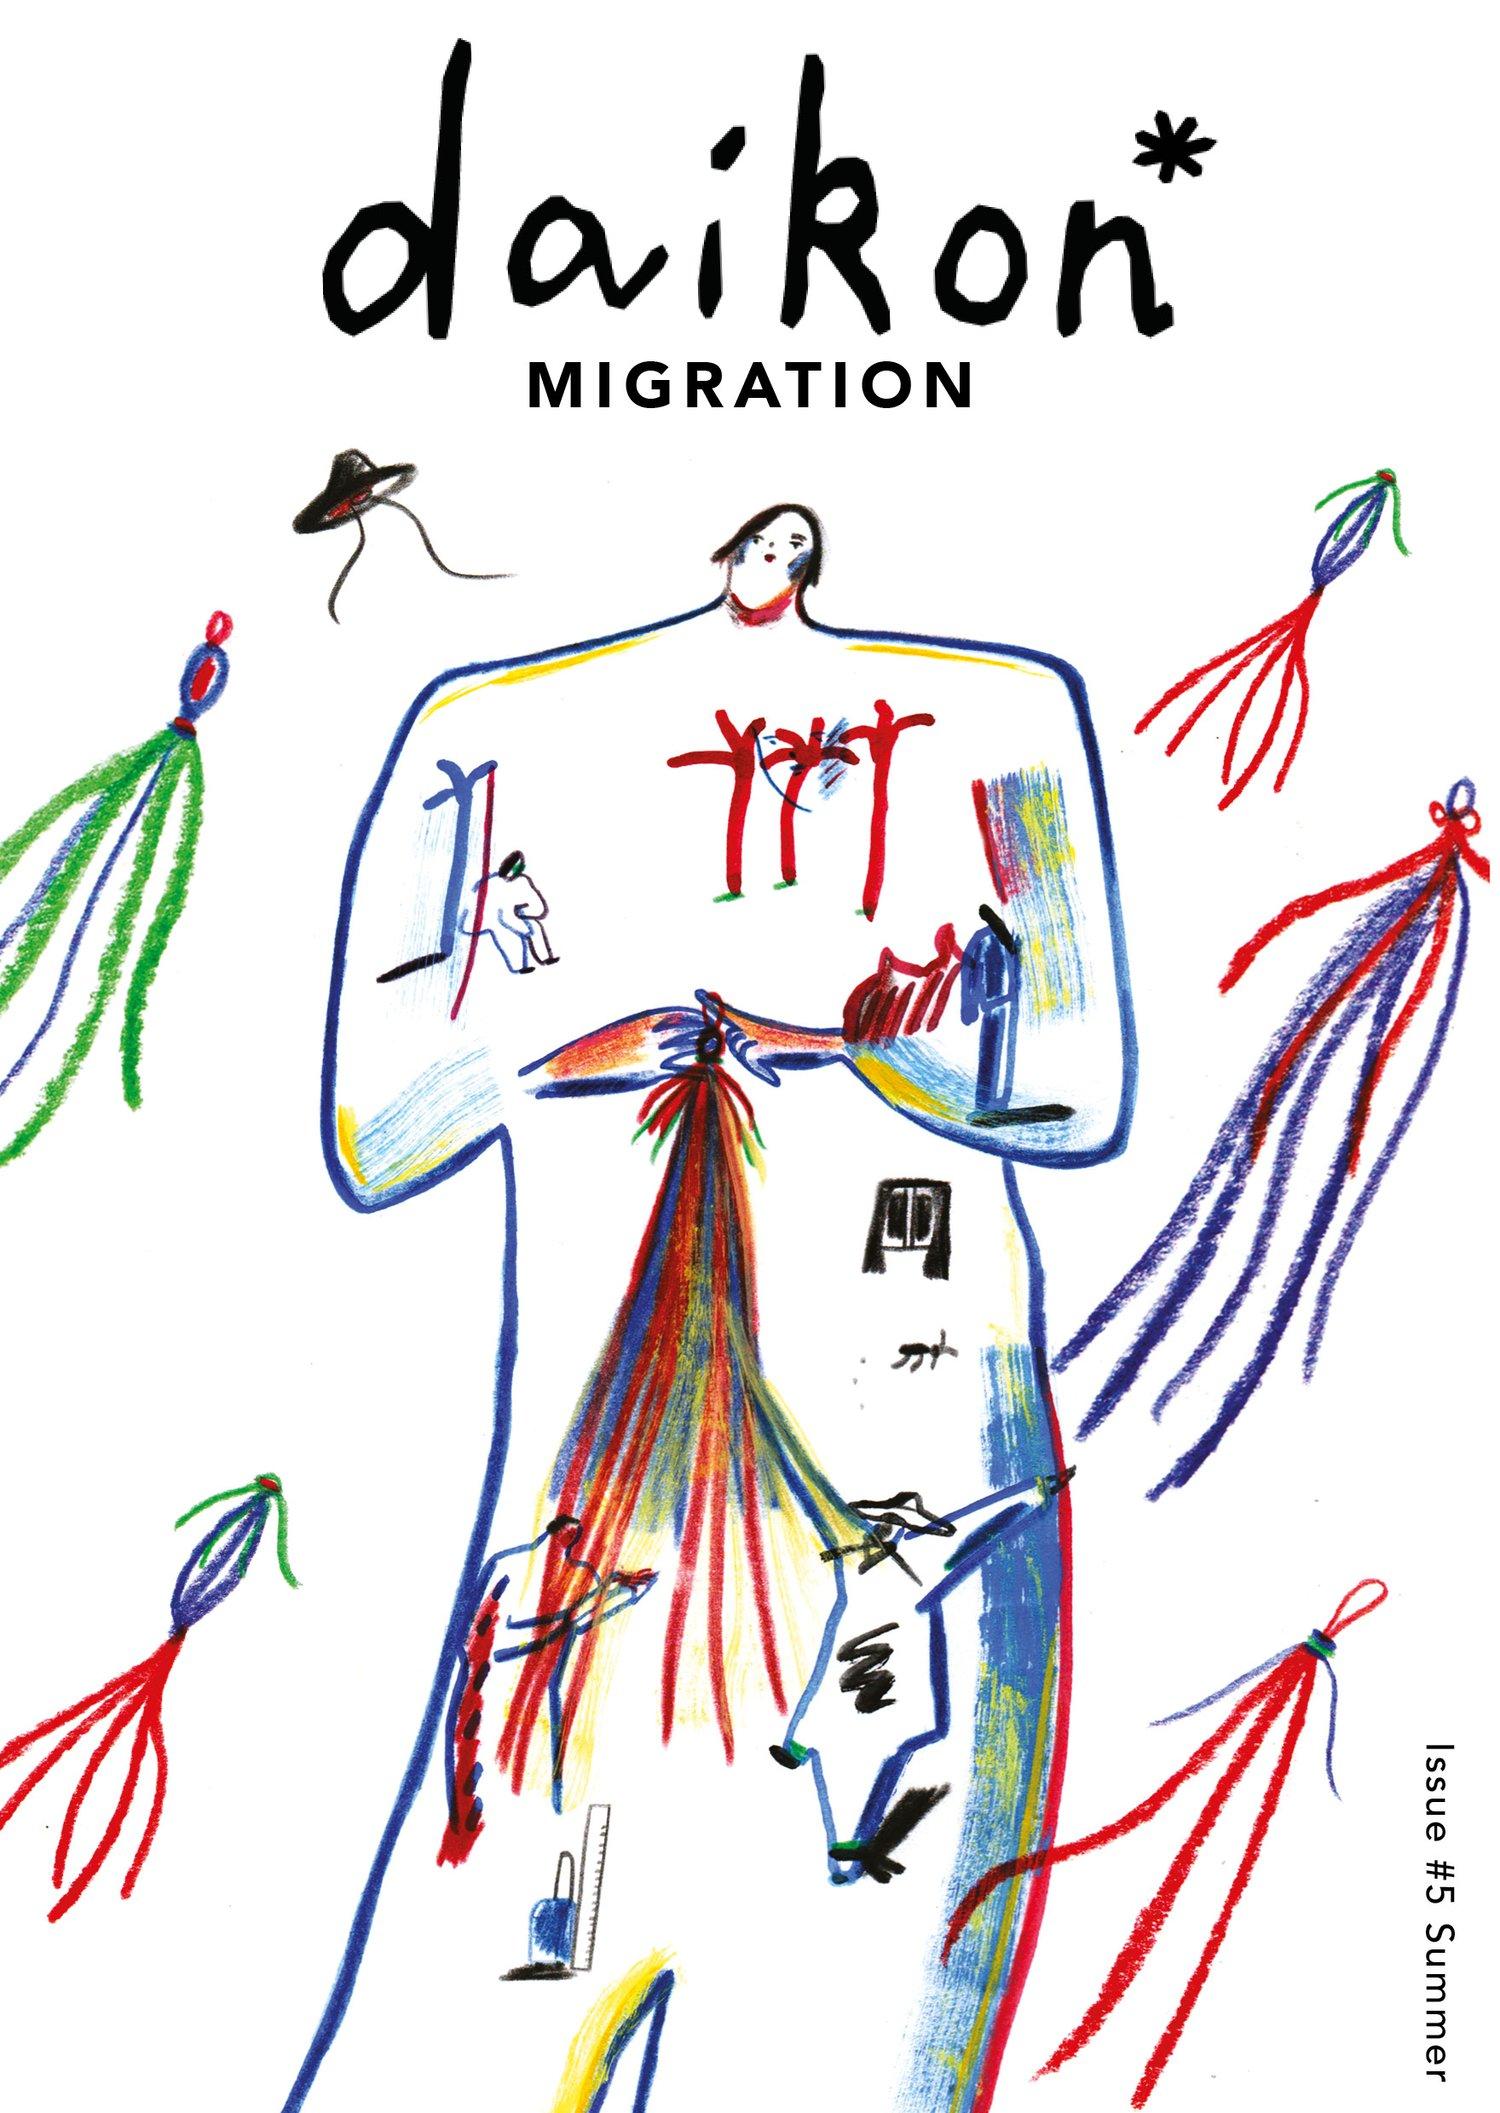 Image of daikon* zine Issue #5 Migration